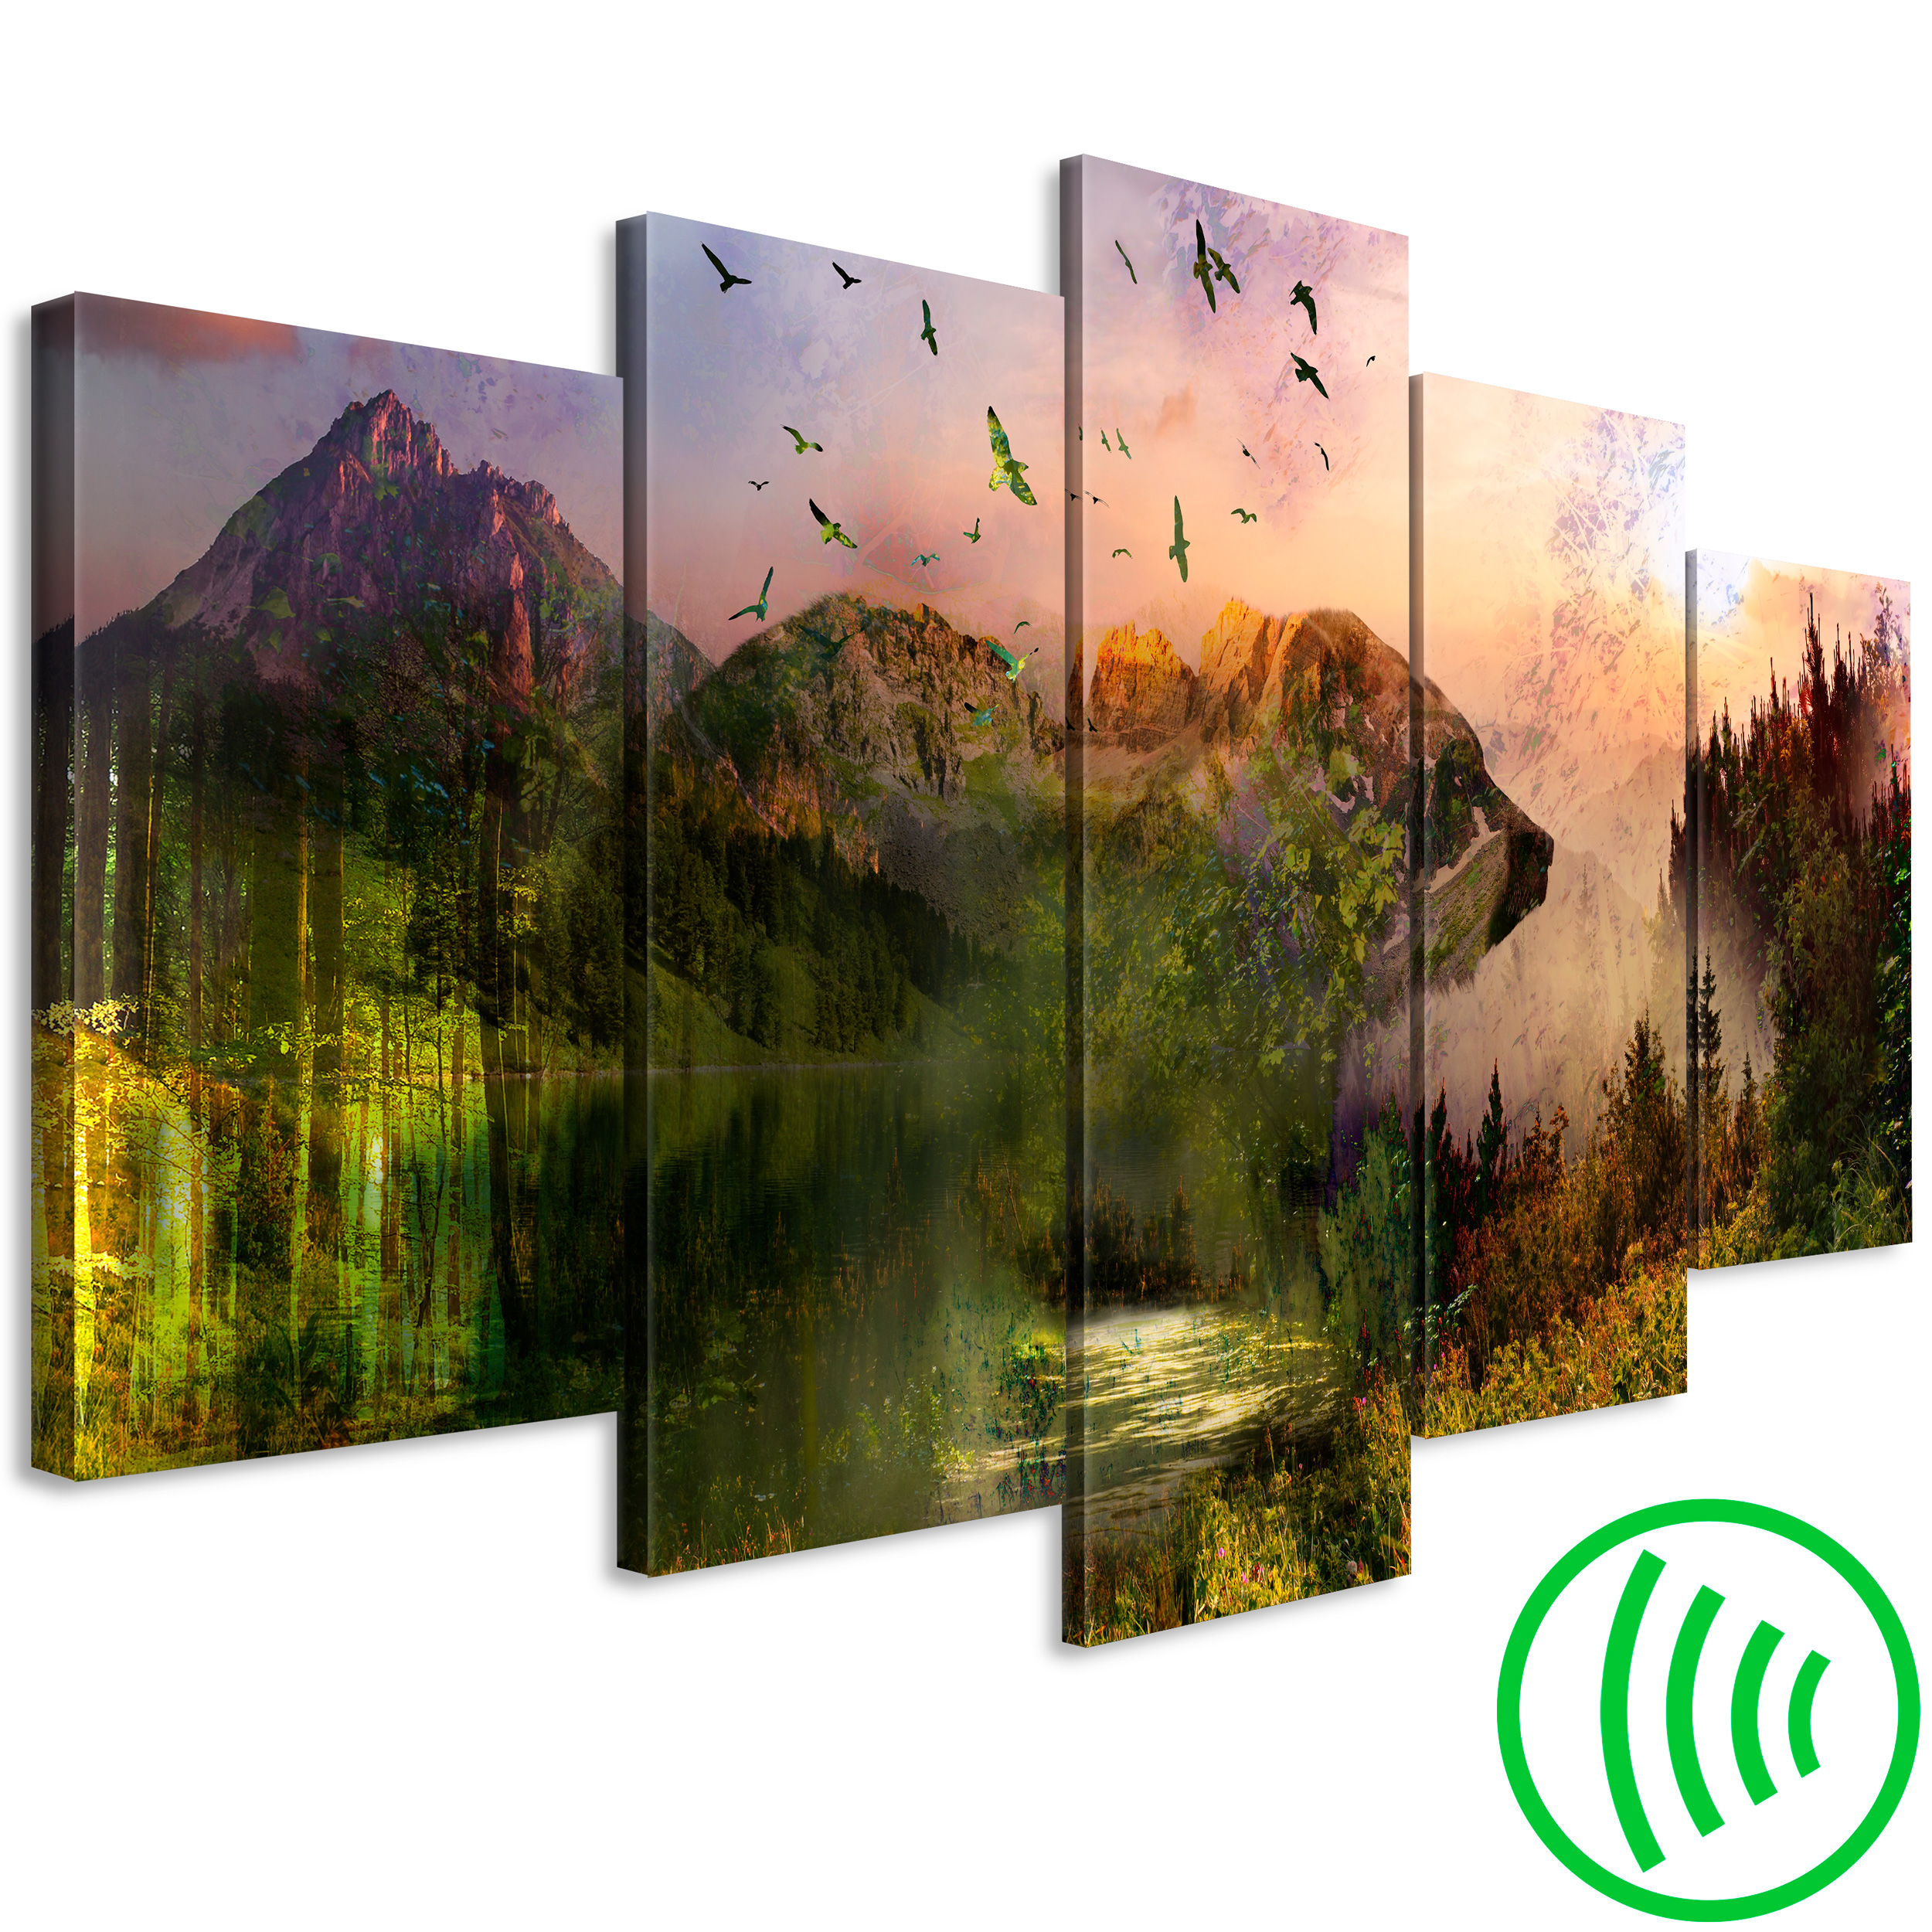 LEINWAND BILDER Landschaft Berge Wald grün WANDBILDER Wohnzimmer xxl ...